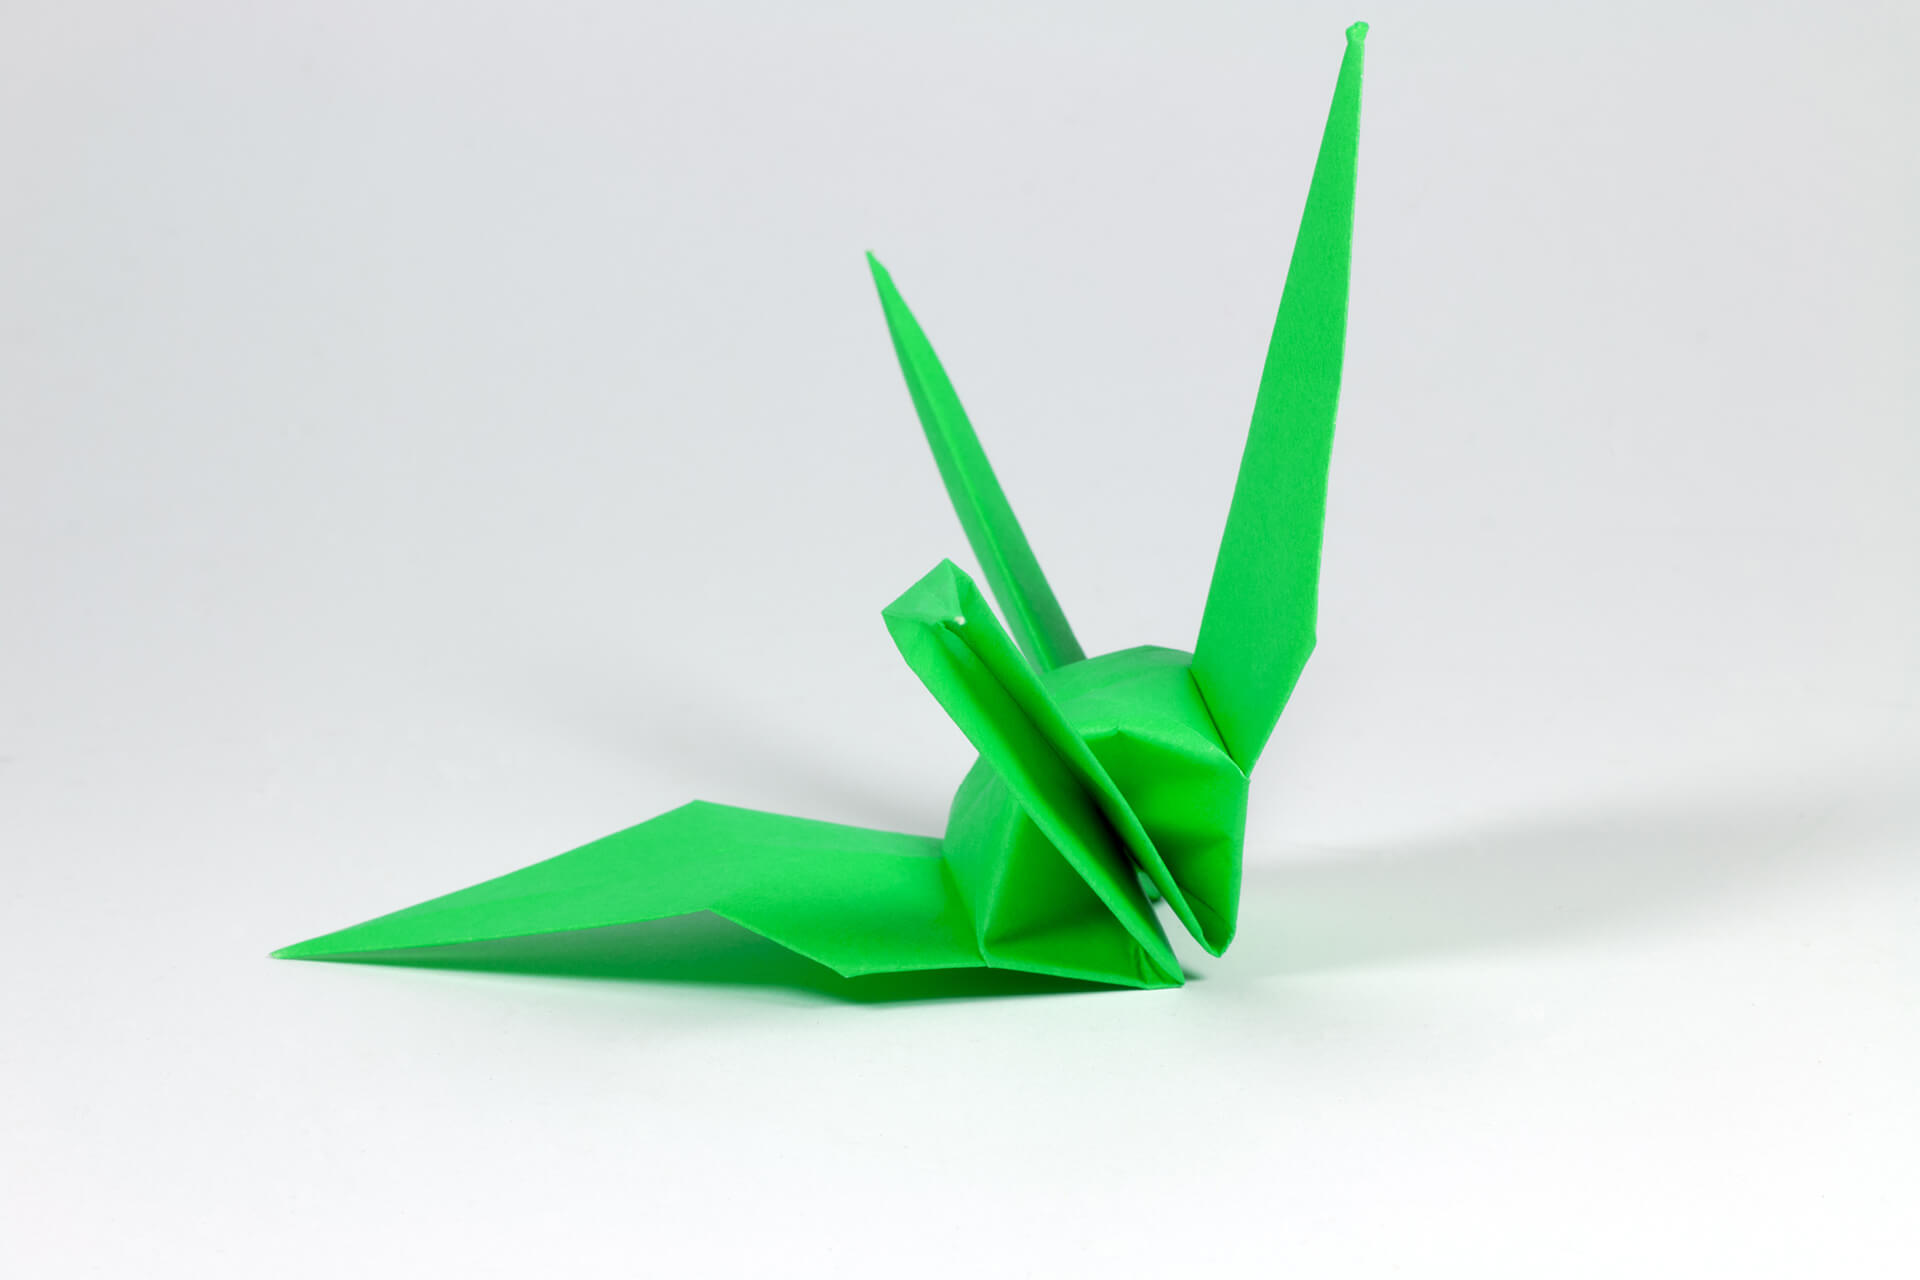 Canva_-_origami_5